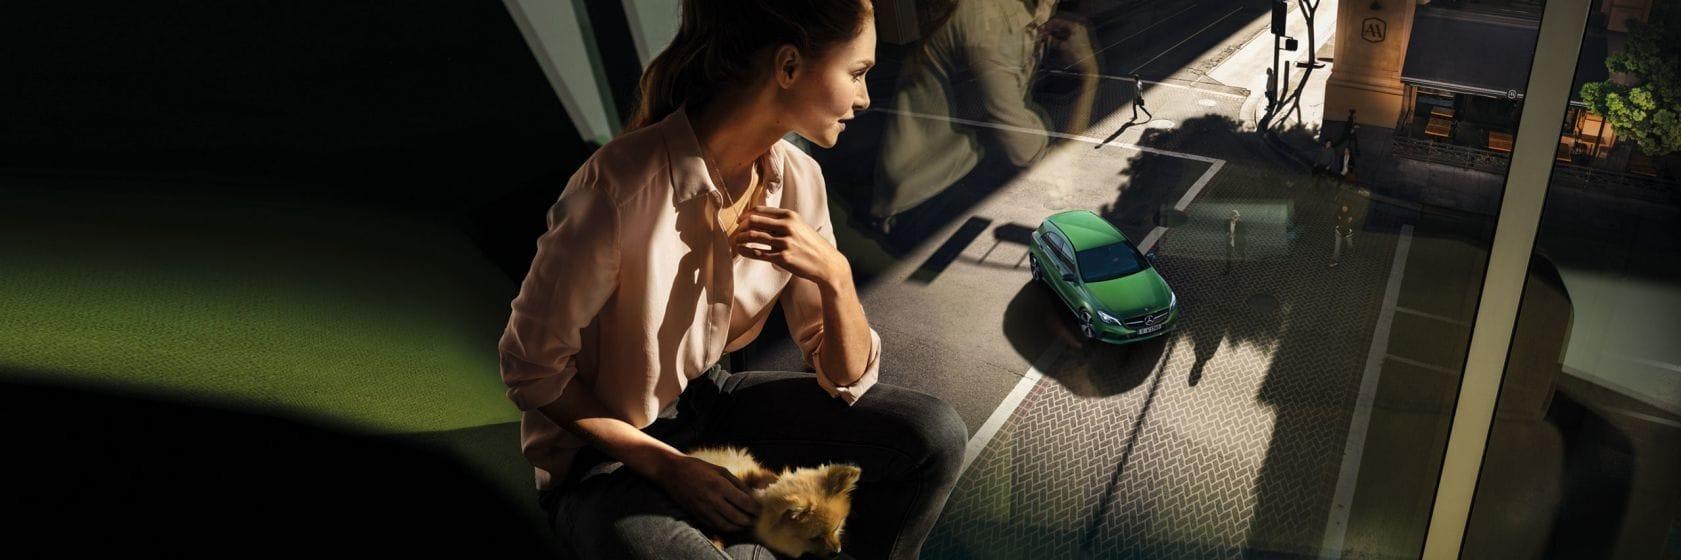 Унікальна пропозиція на нові моделі Mercedes-AMG